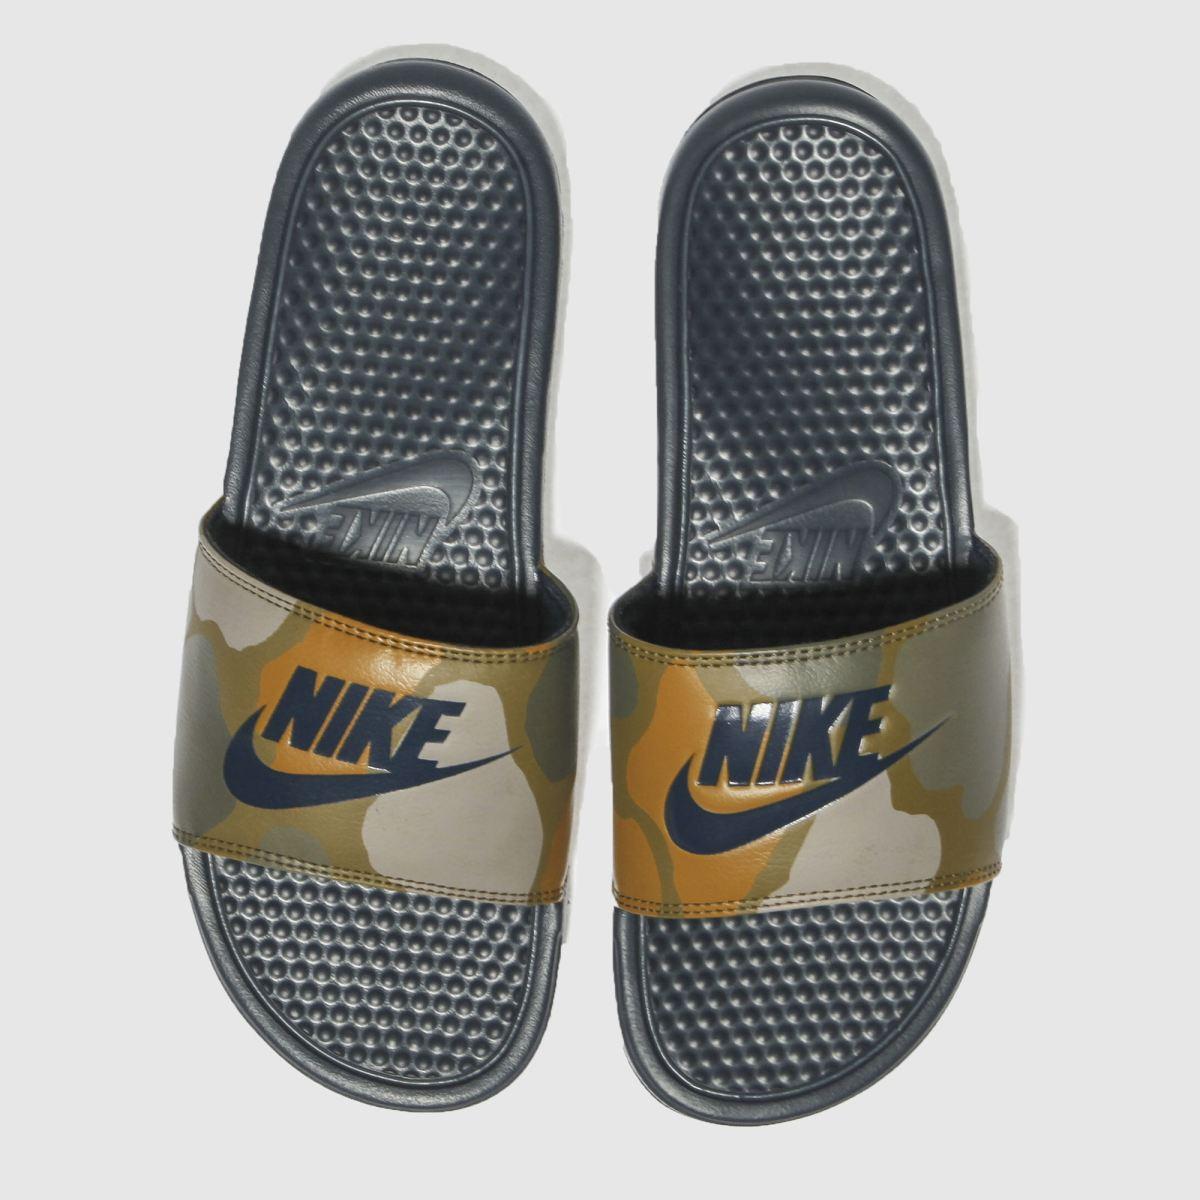 Nike Khaki Benassi Slide Sandals